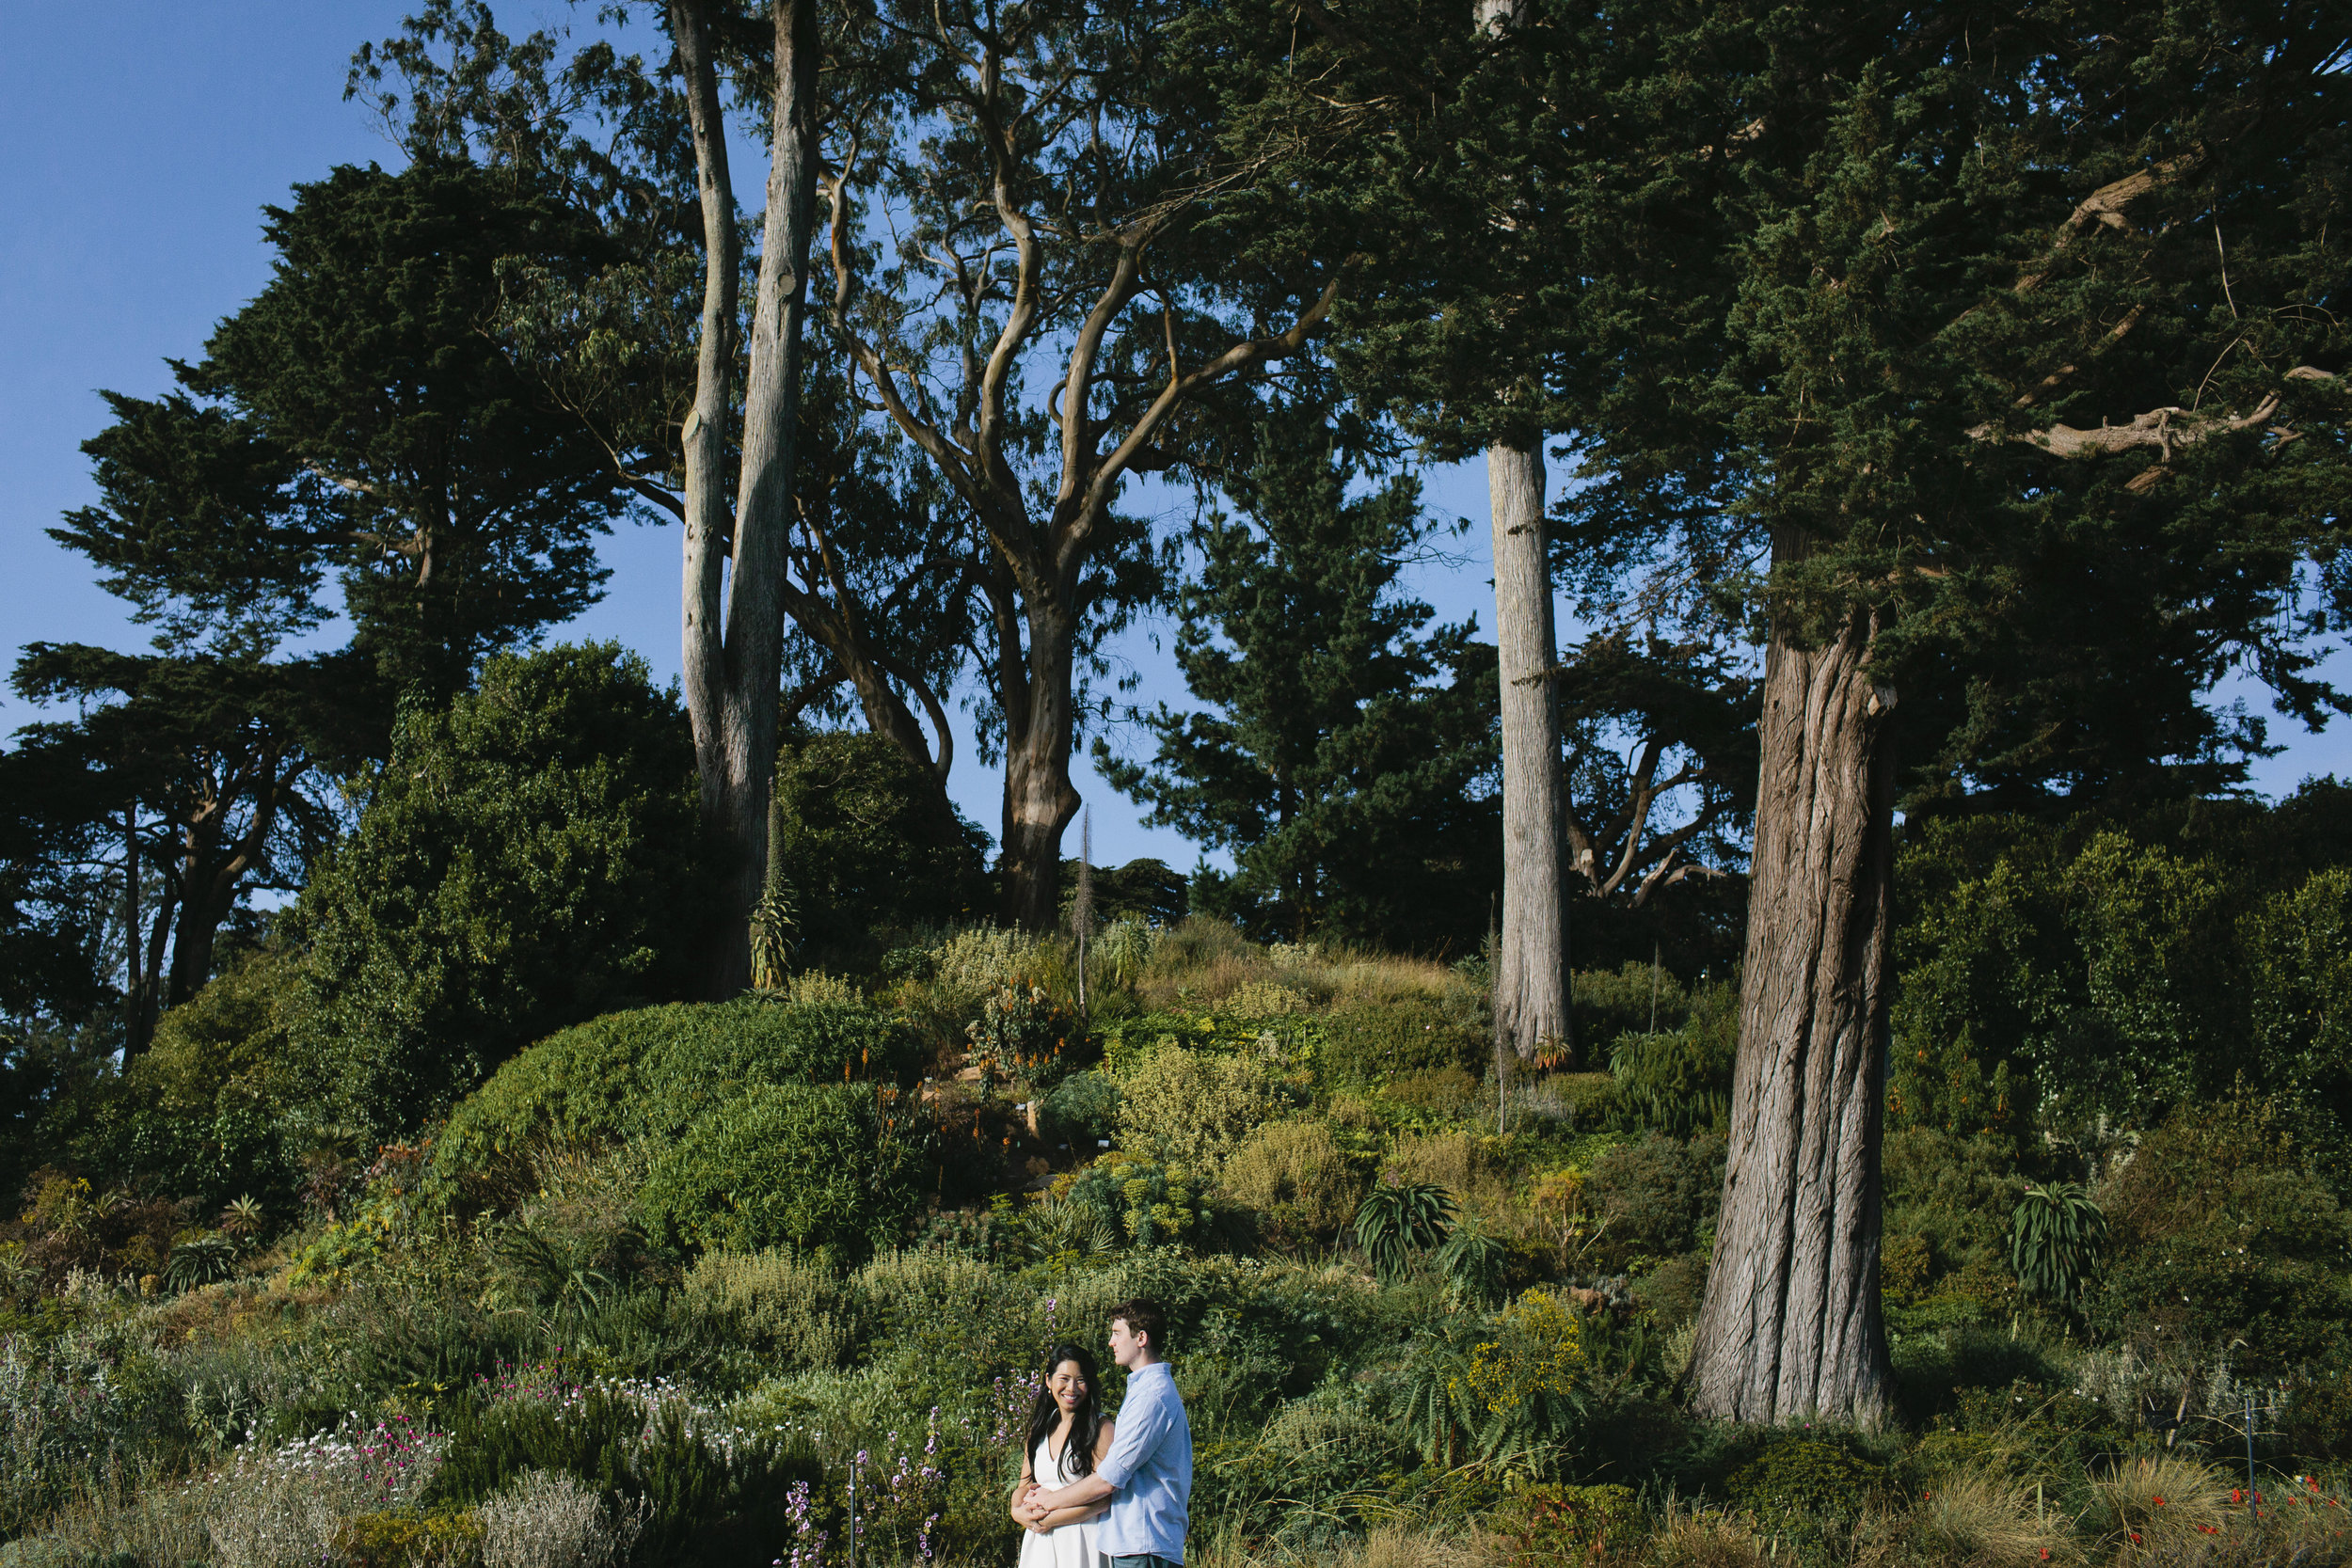 Jenn and Landon had a Botanical Gardens engagement session in Golden Gate Park.